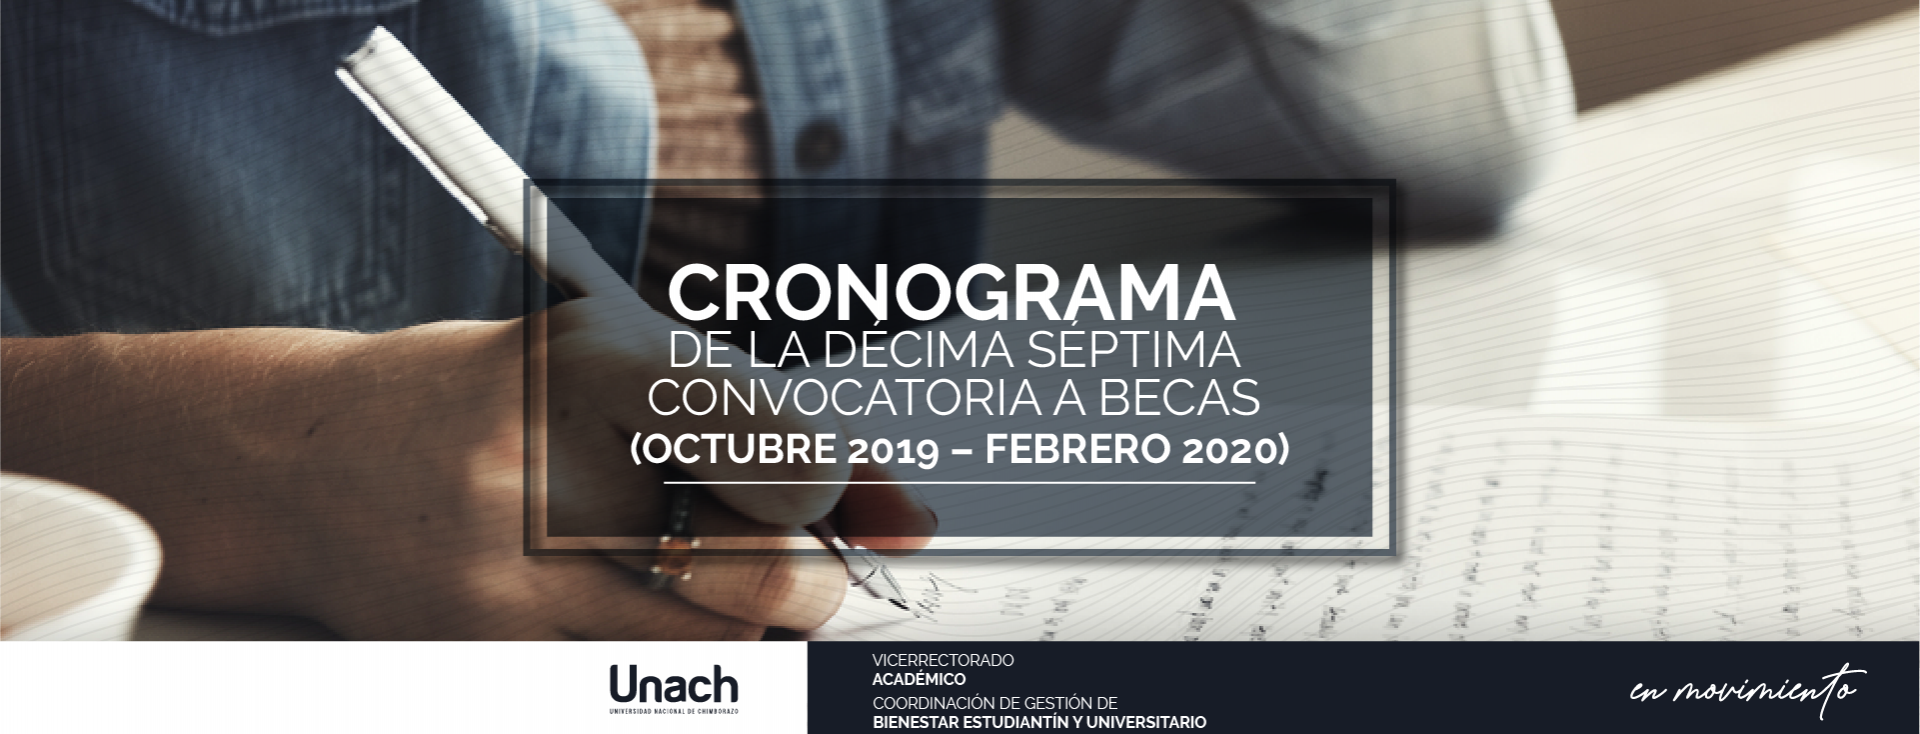 CRONOGRAMA  DE LA DÉCIMA SÉPTIMA  CONVOCATORIA A BECAS  (OCTUBRE 2019 – FEBRERO 2020)